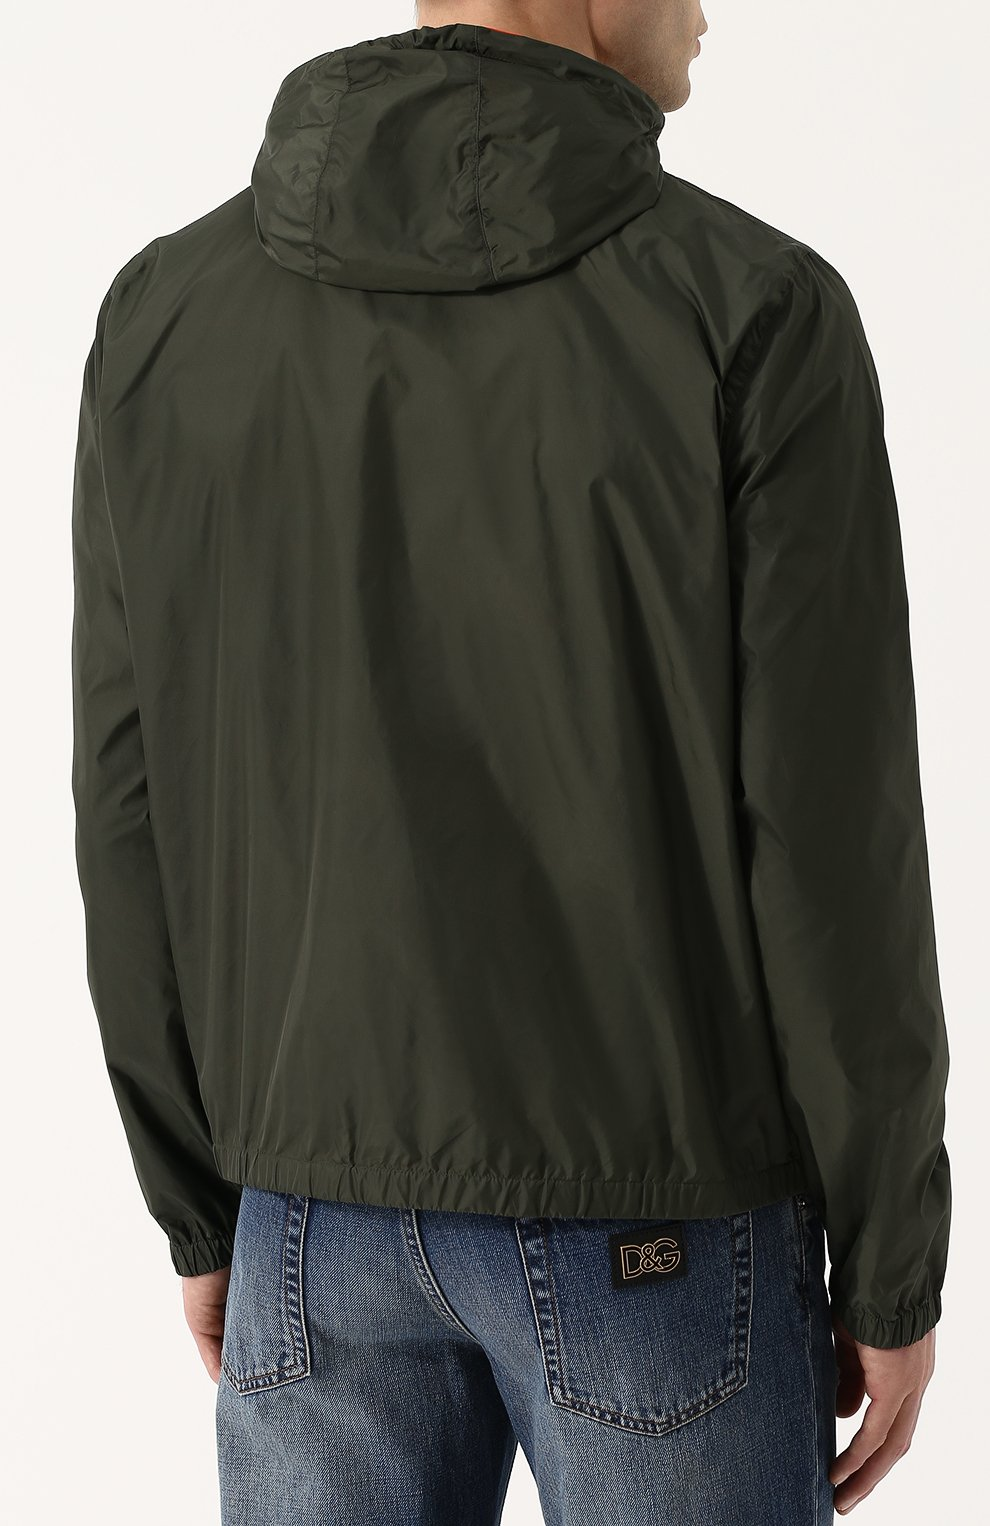 Двусторонняя куртка на молнии с капюшоном | Фото №4